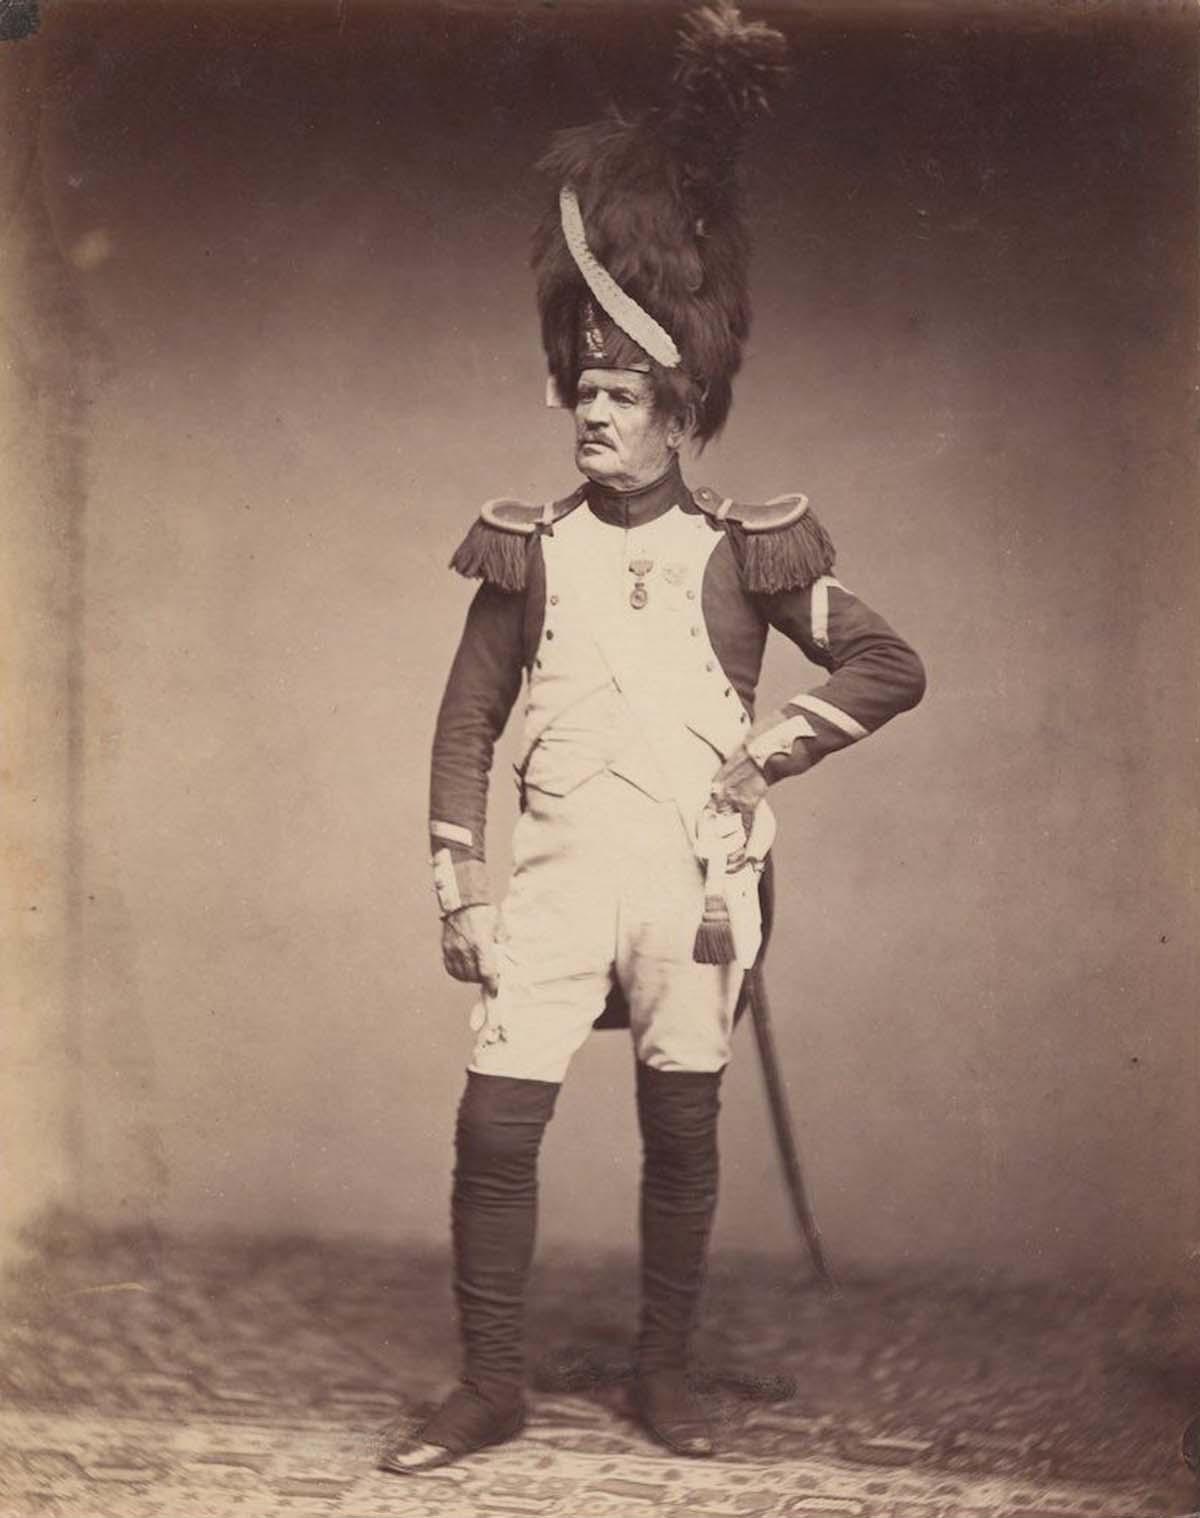 Sergeant Taria in the uniform of the Grenadiere de la Garde of 1809-1815.